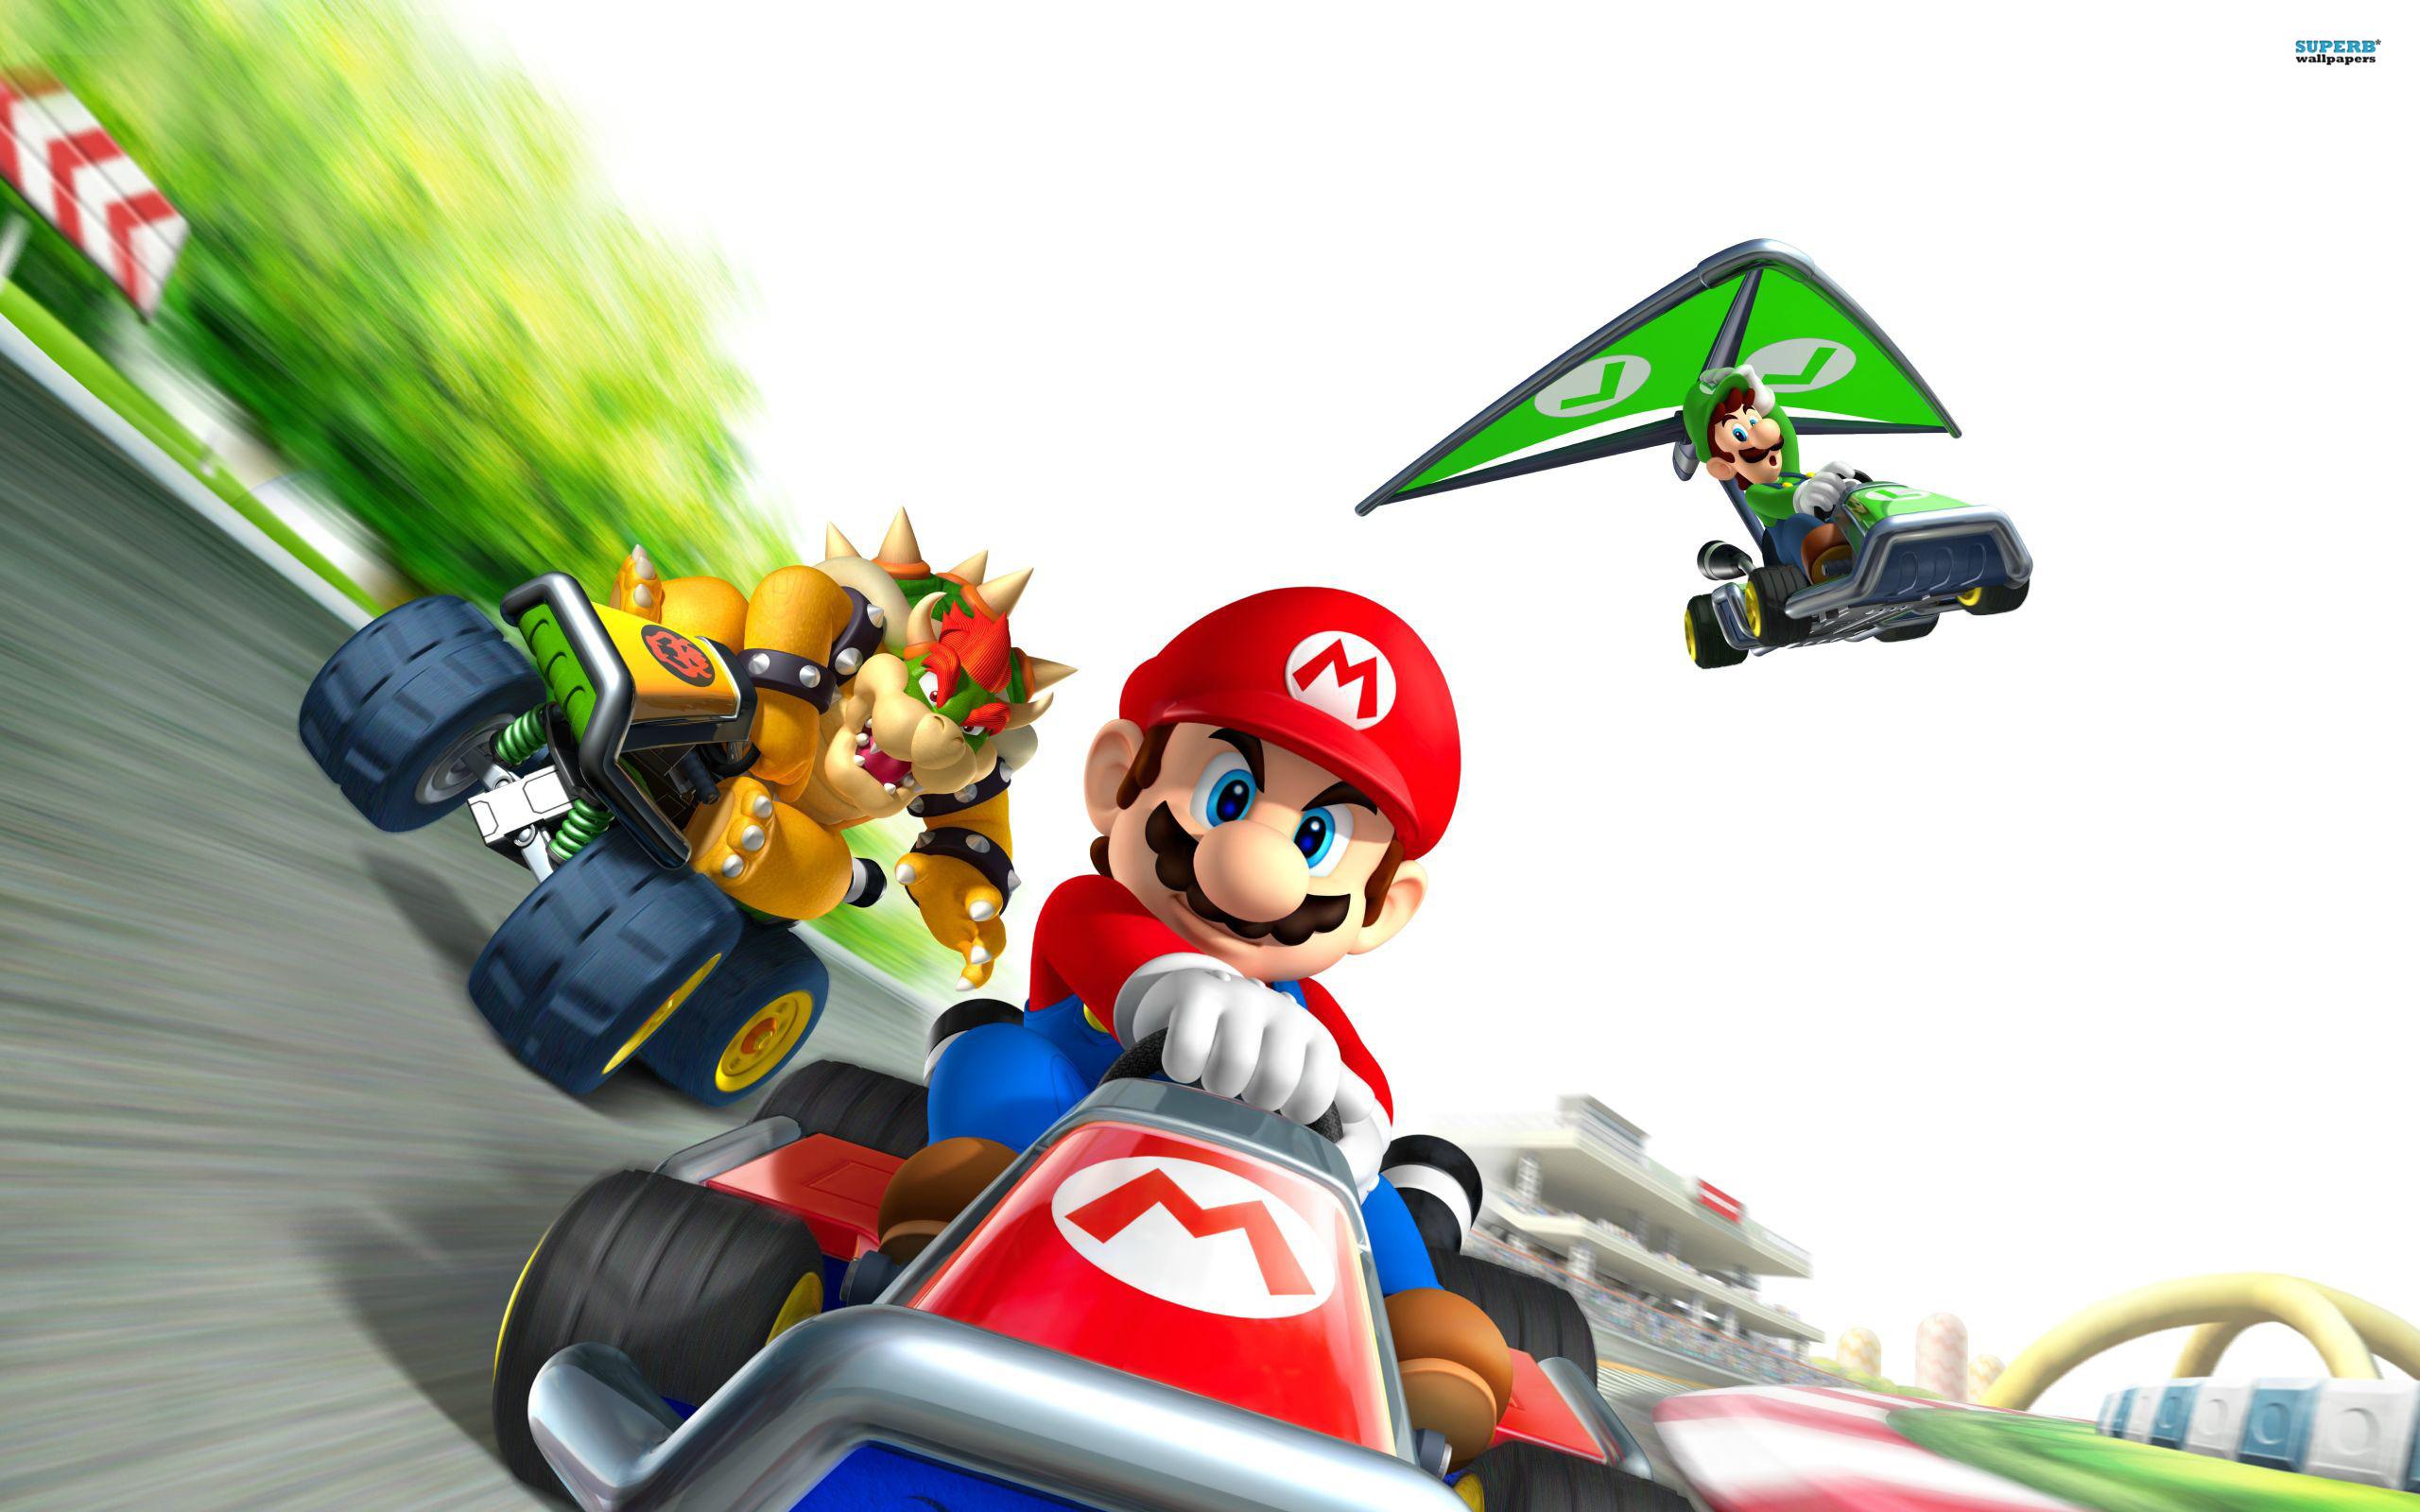 Mario Kart Wallpaper 13086